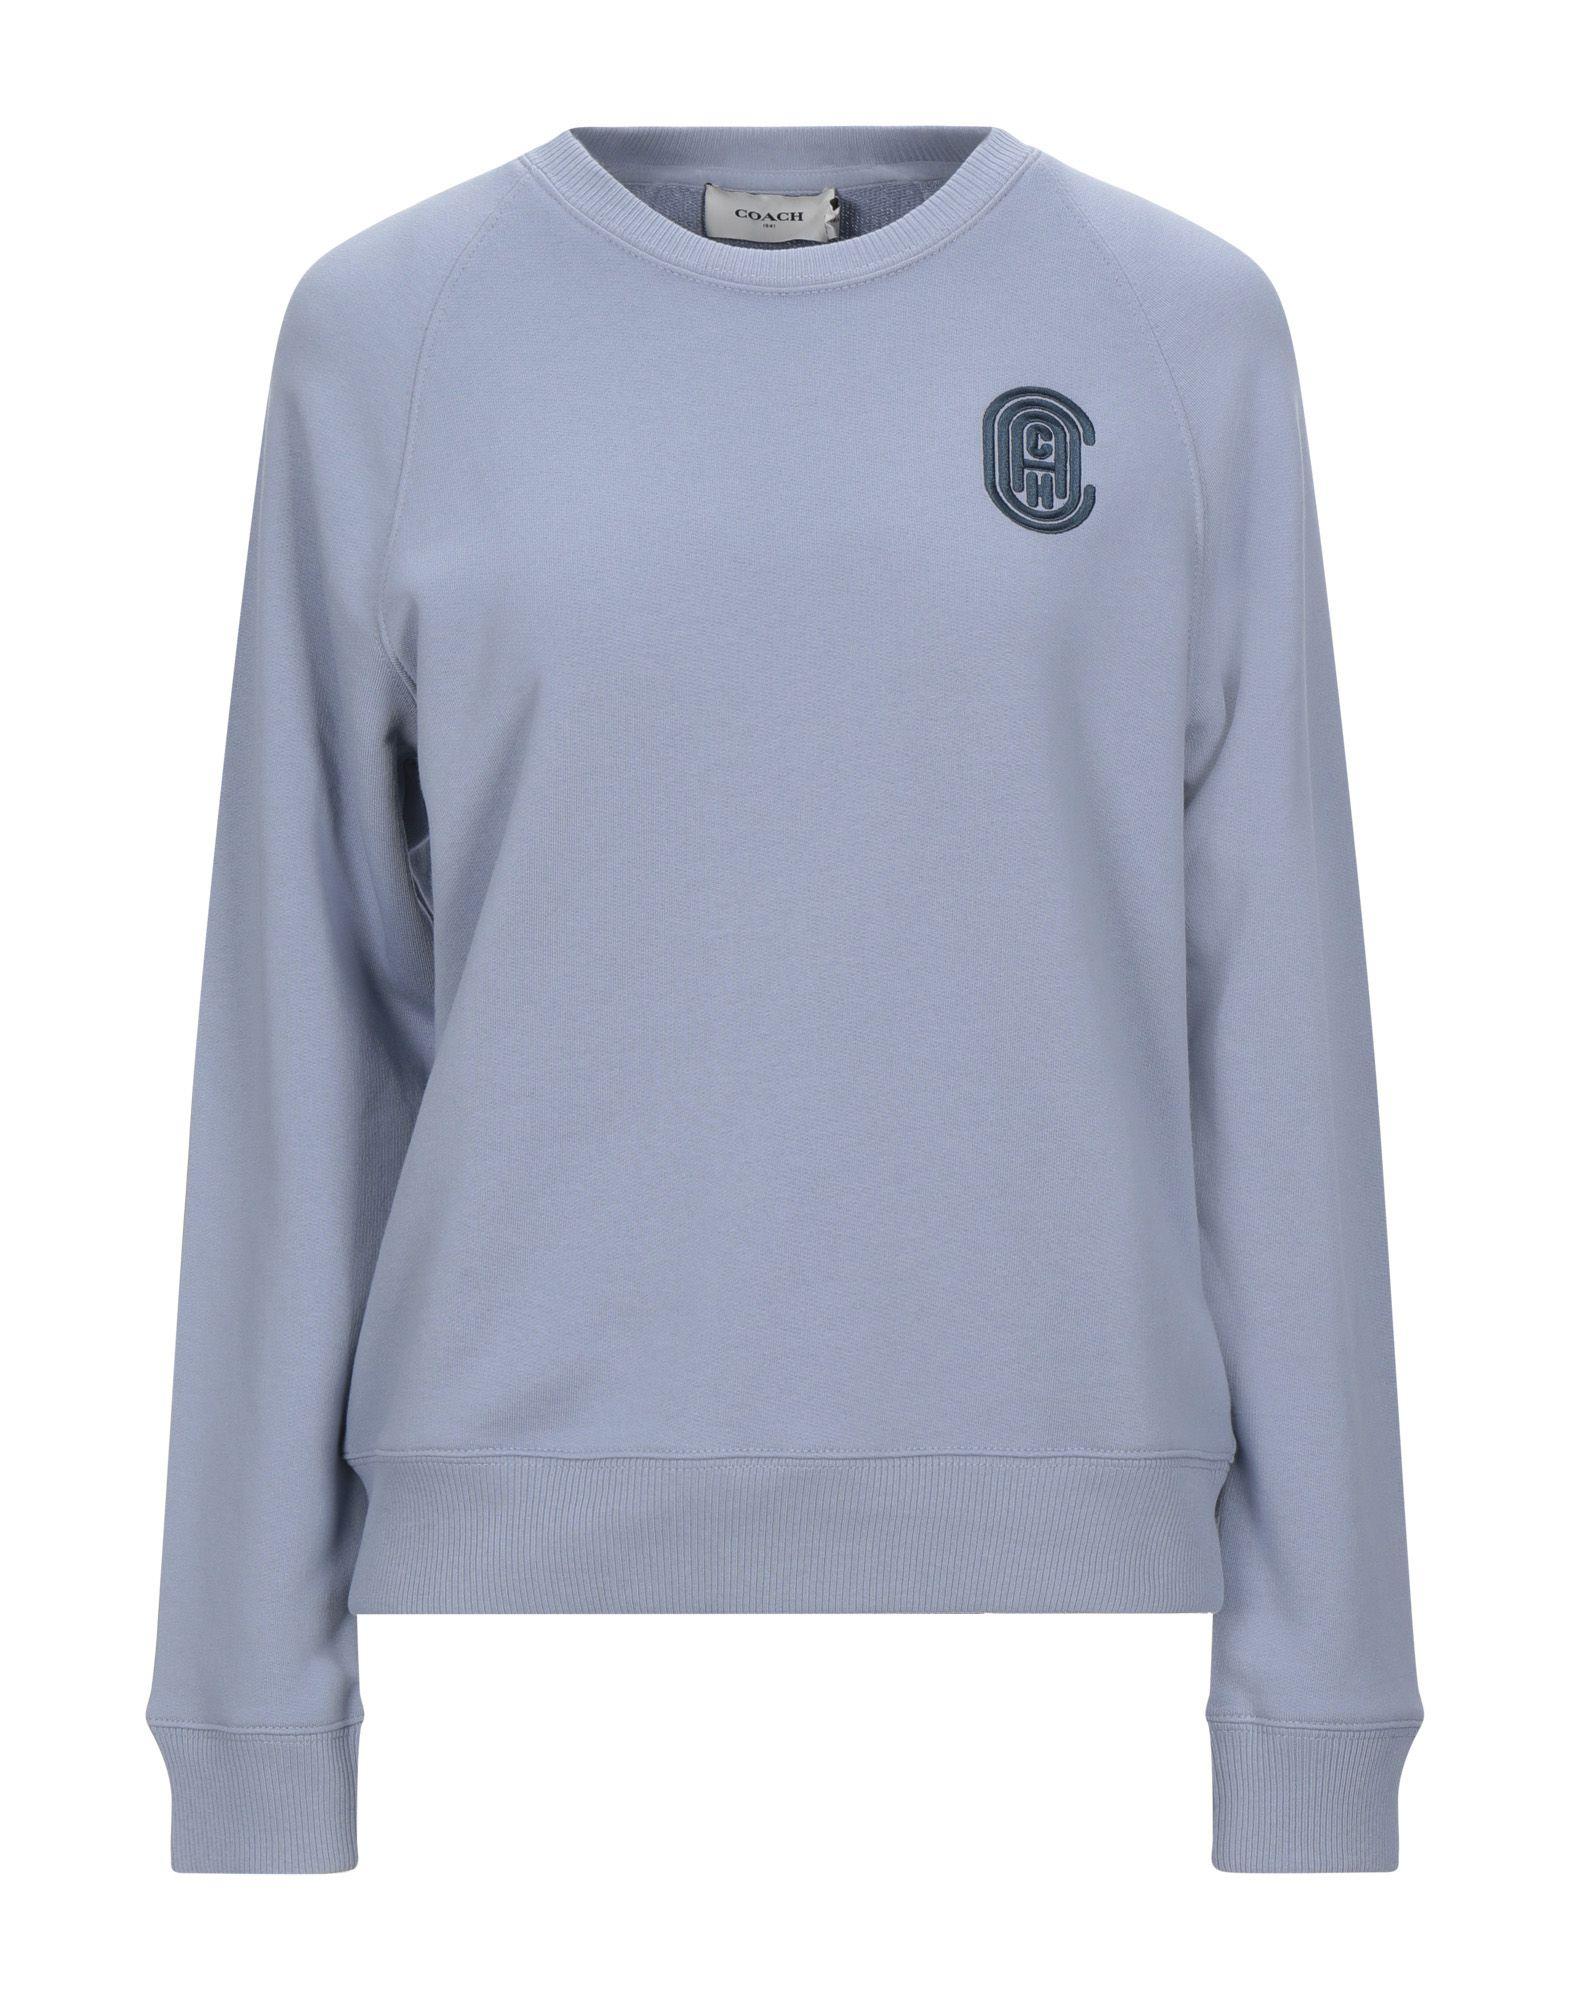 COACH Sweatshirts. sweatshirt fleece, embroidered detailing, solid color, round collar, long sleeves, no pockets. 100% Cotton